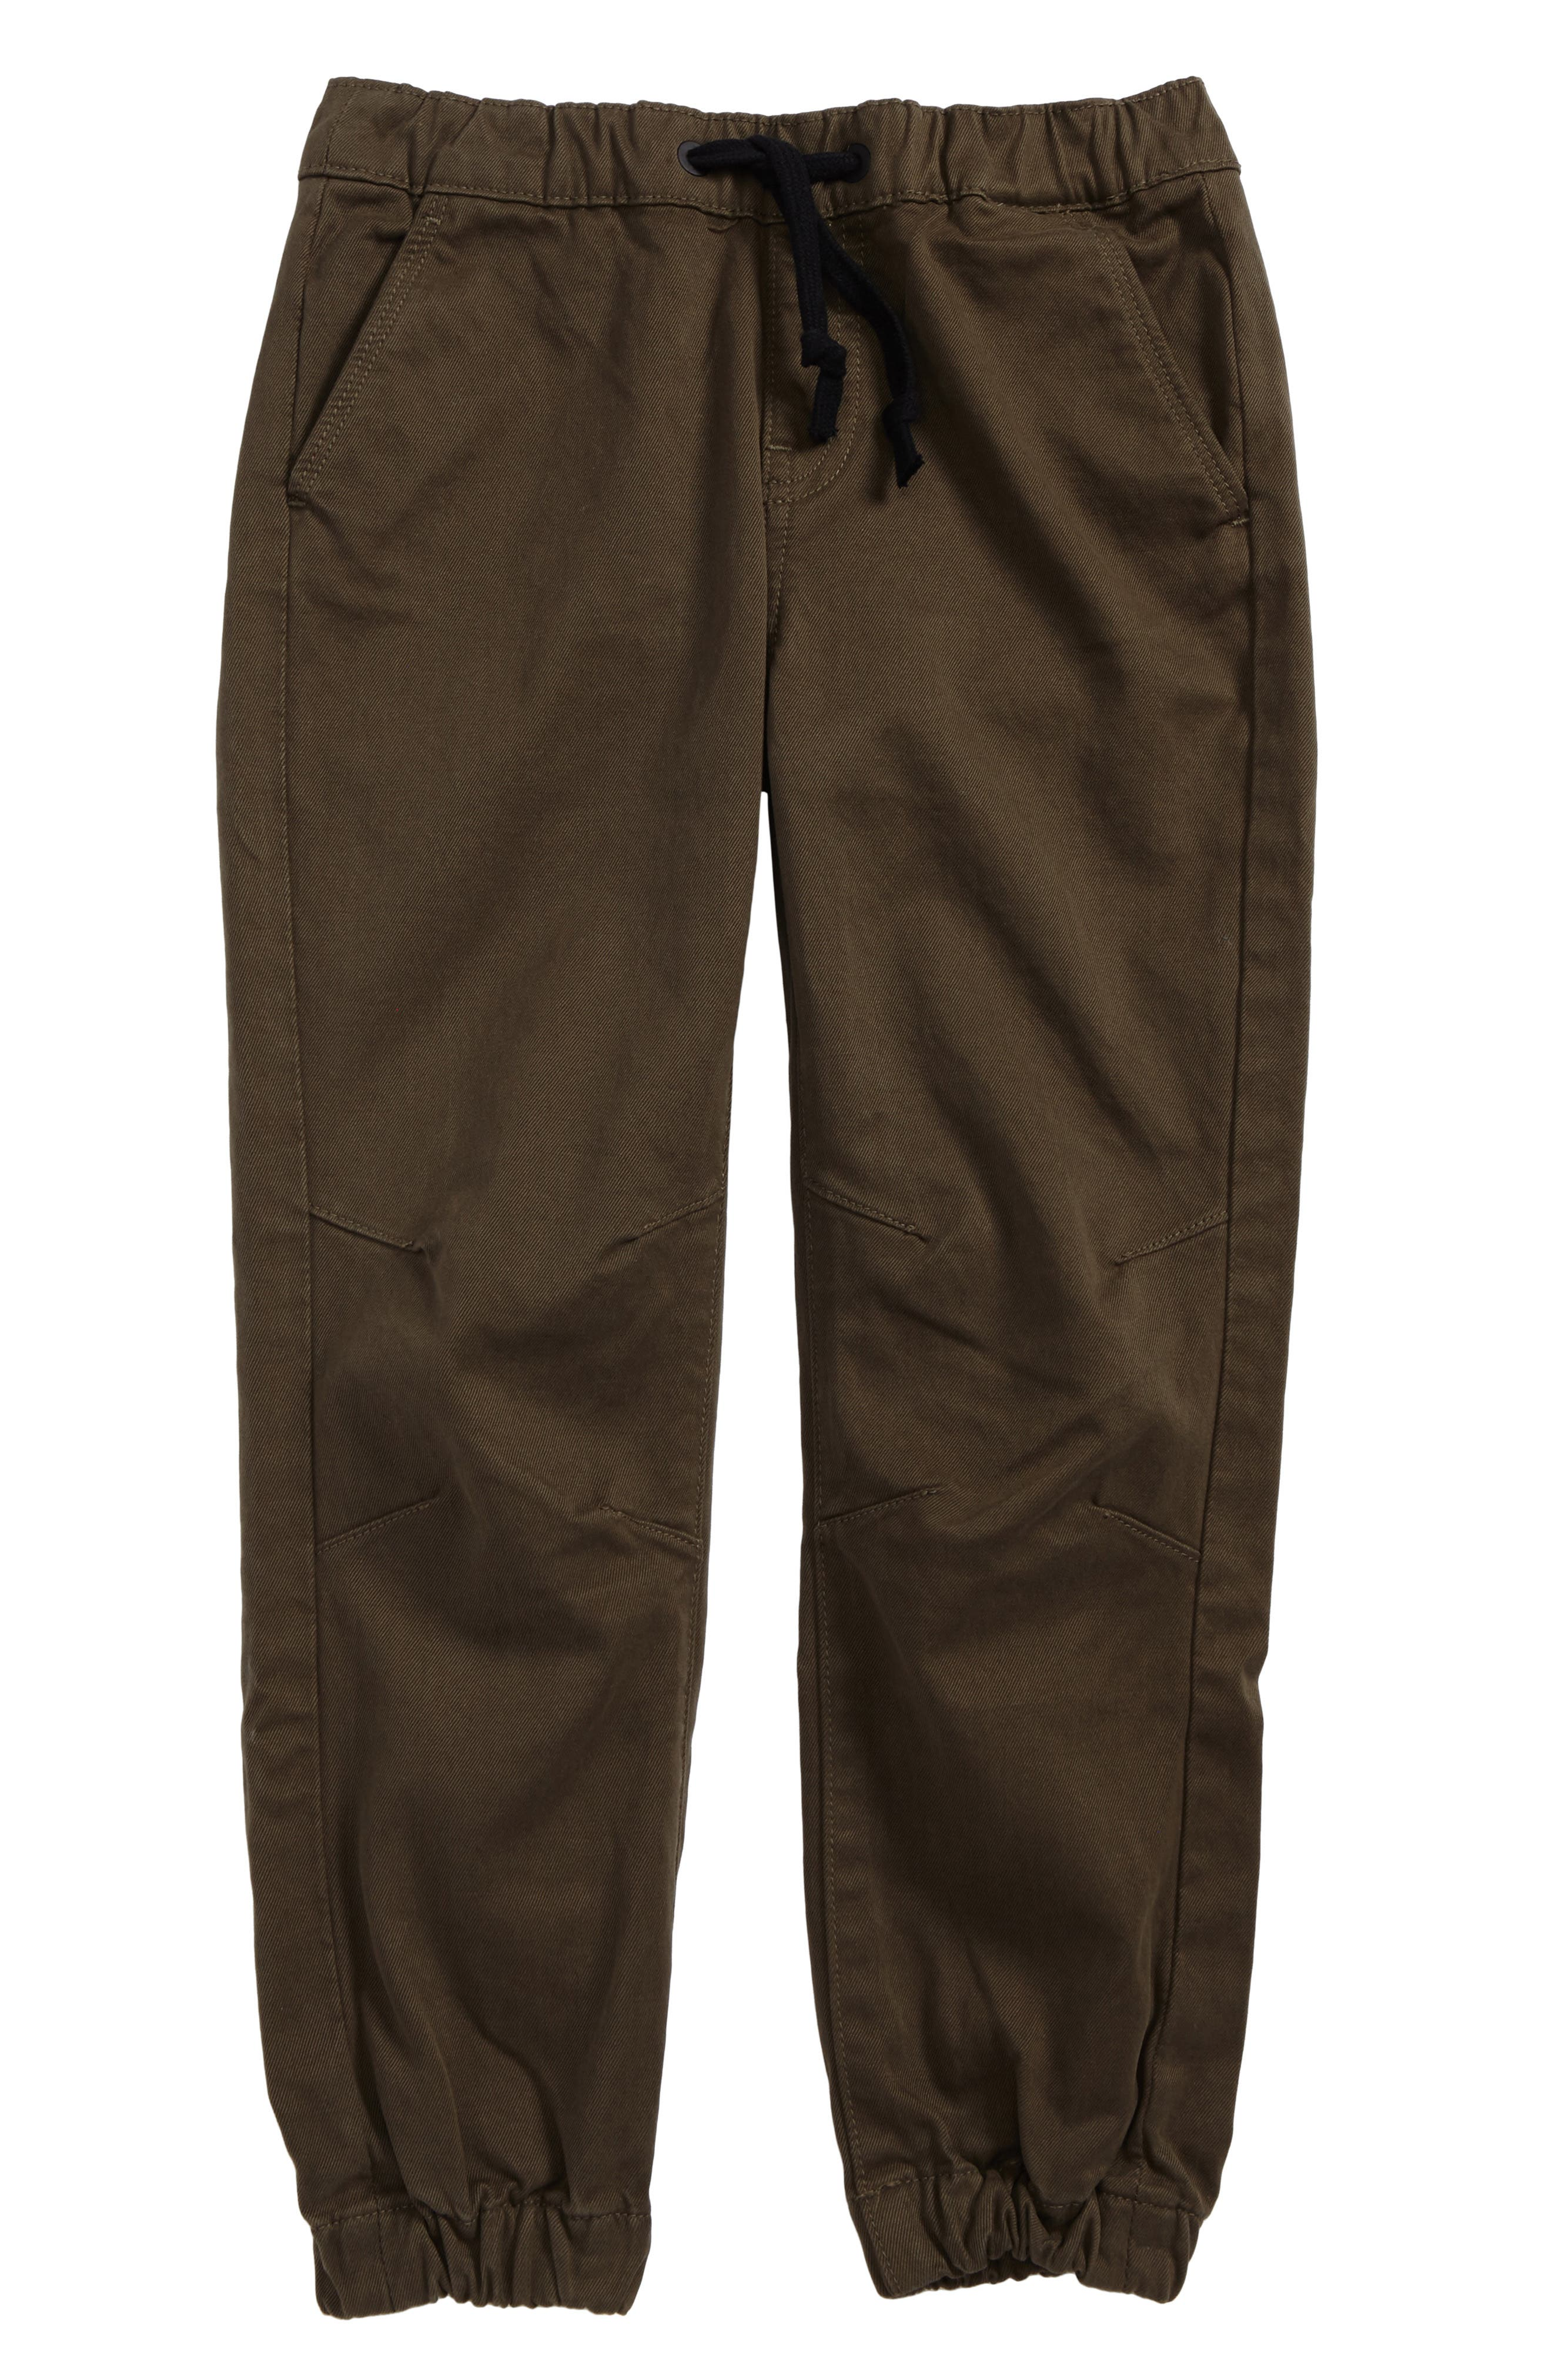 Jackson Jogger Pants,                         Main,                         color, 301